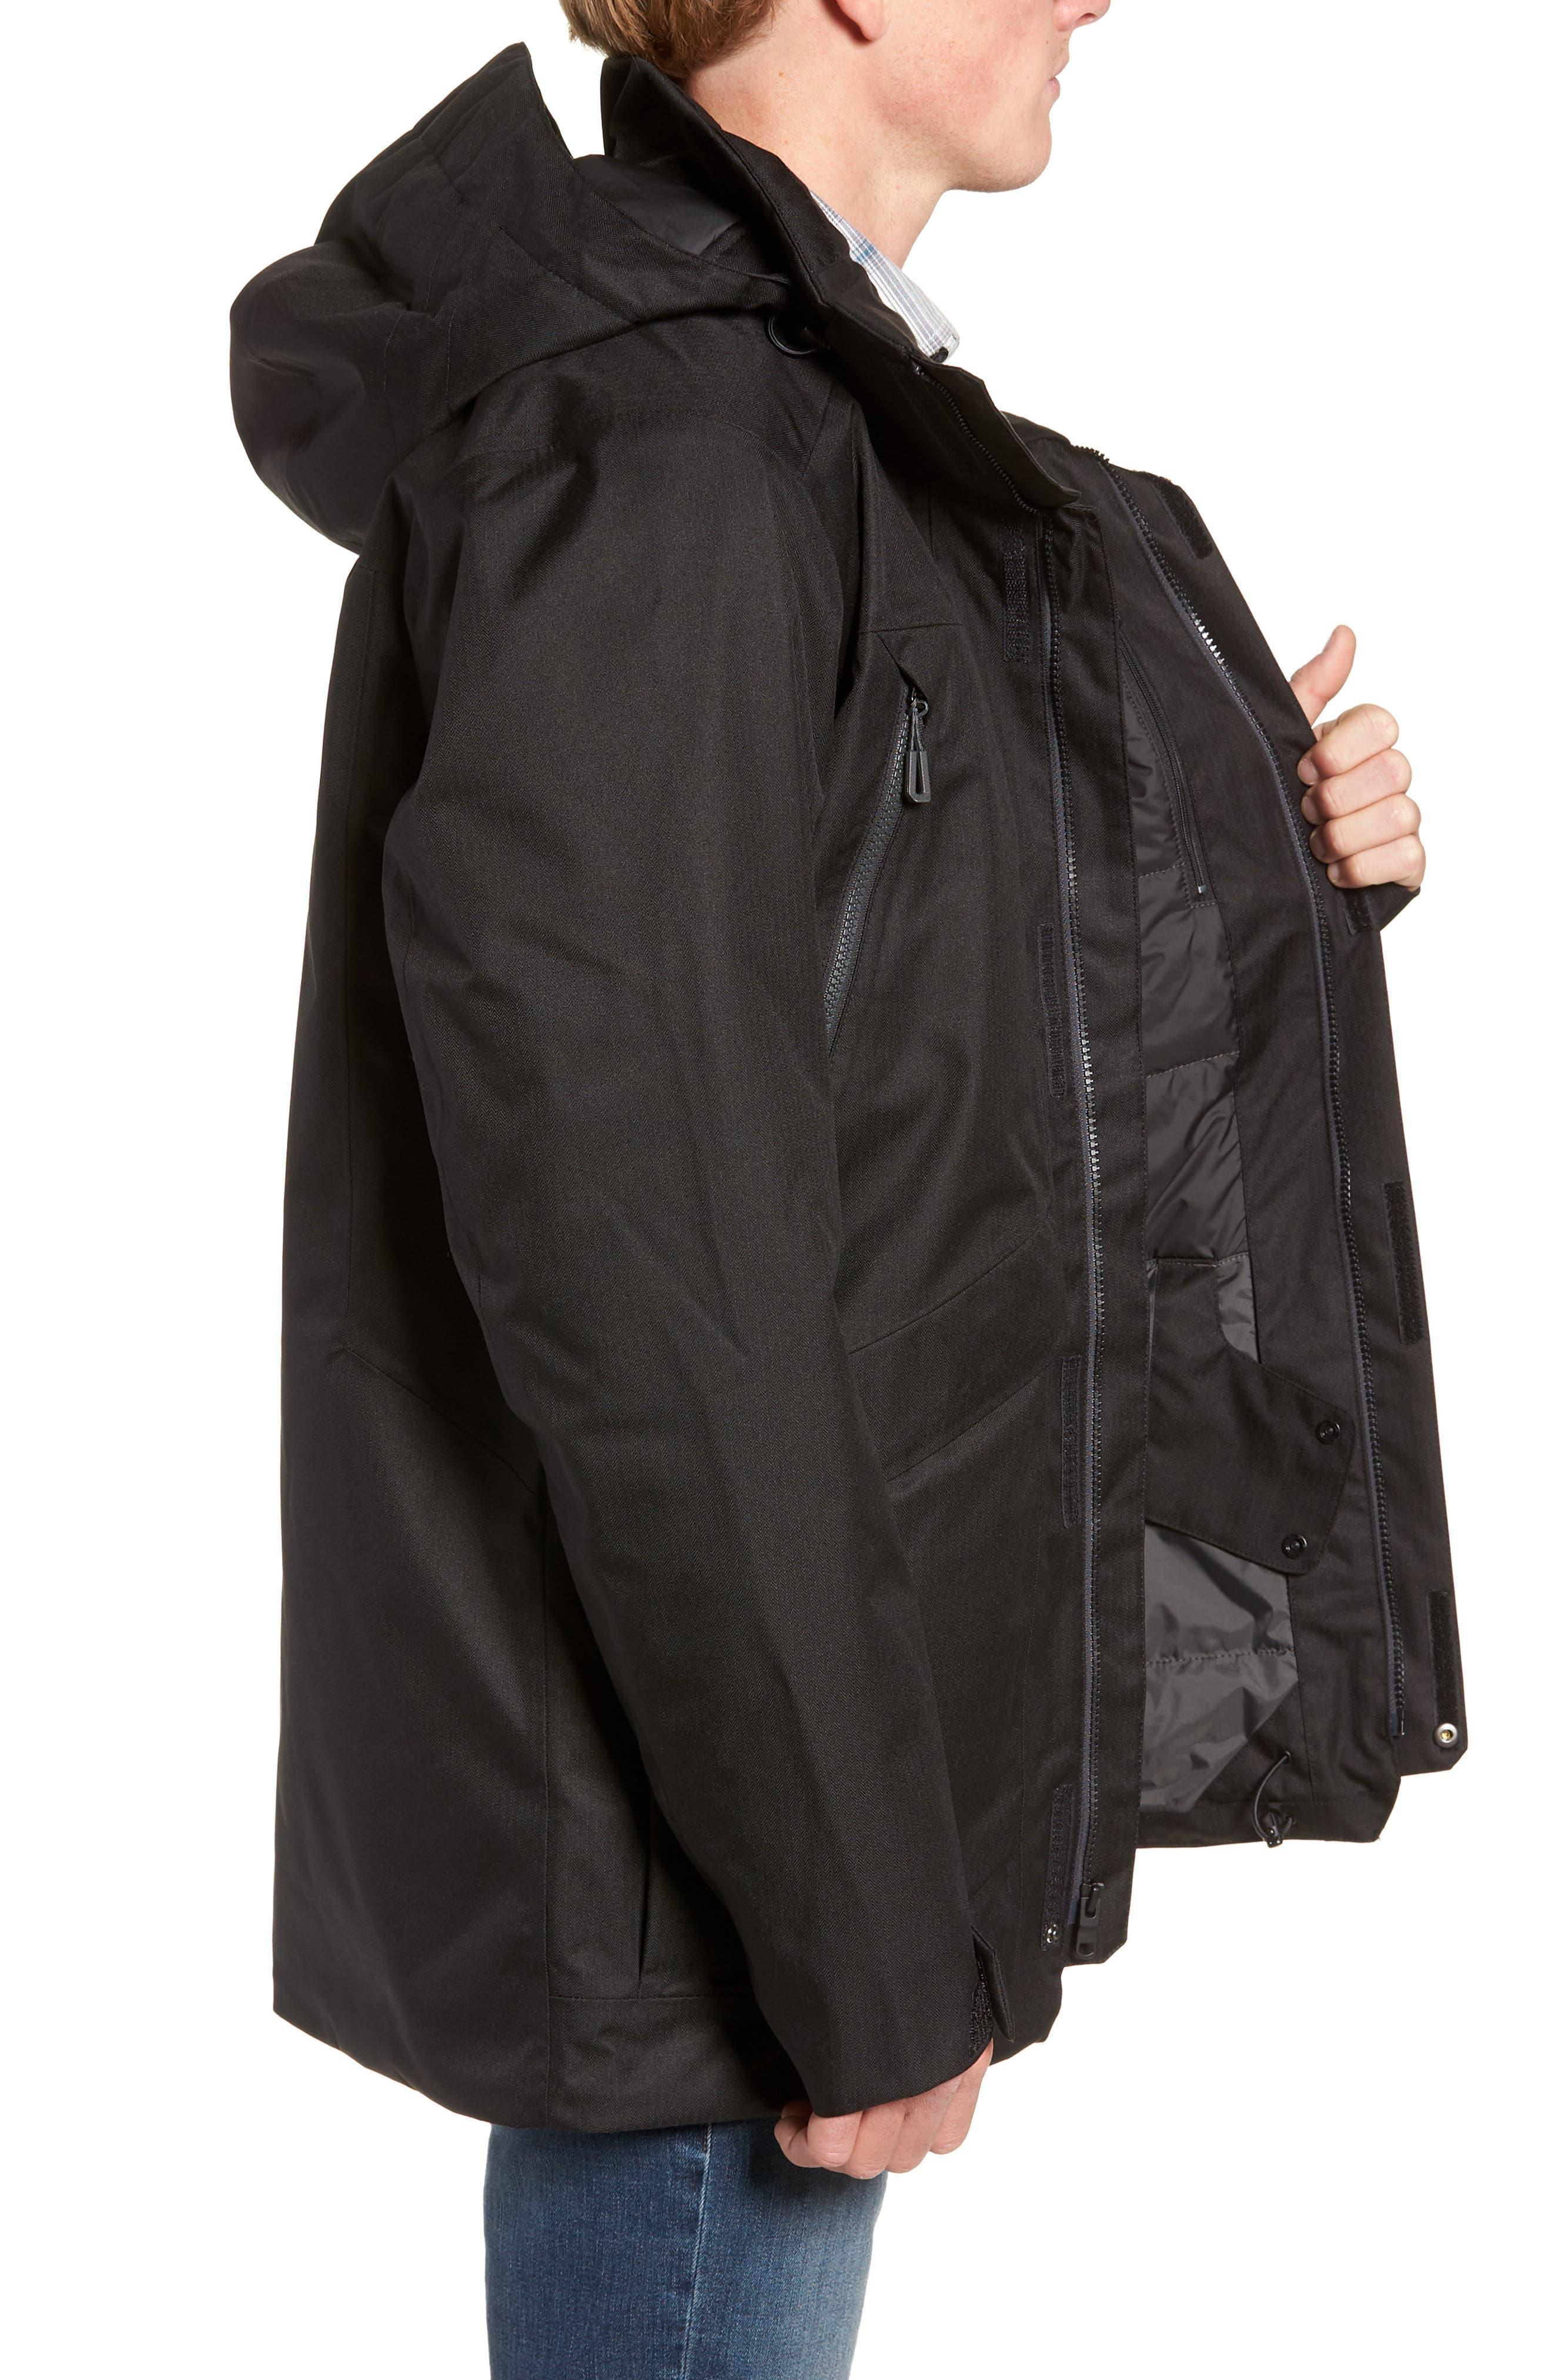 THE NORTH FACE, Gatekeeper Waterproof Jacket, Alternate thumbnail 4, color, 005